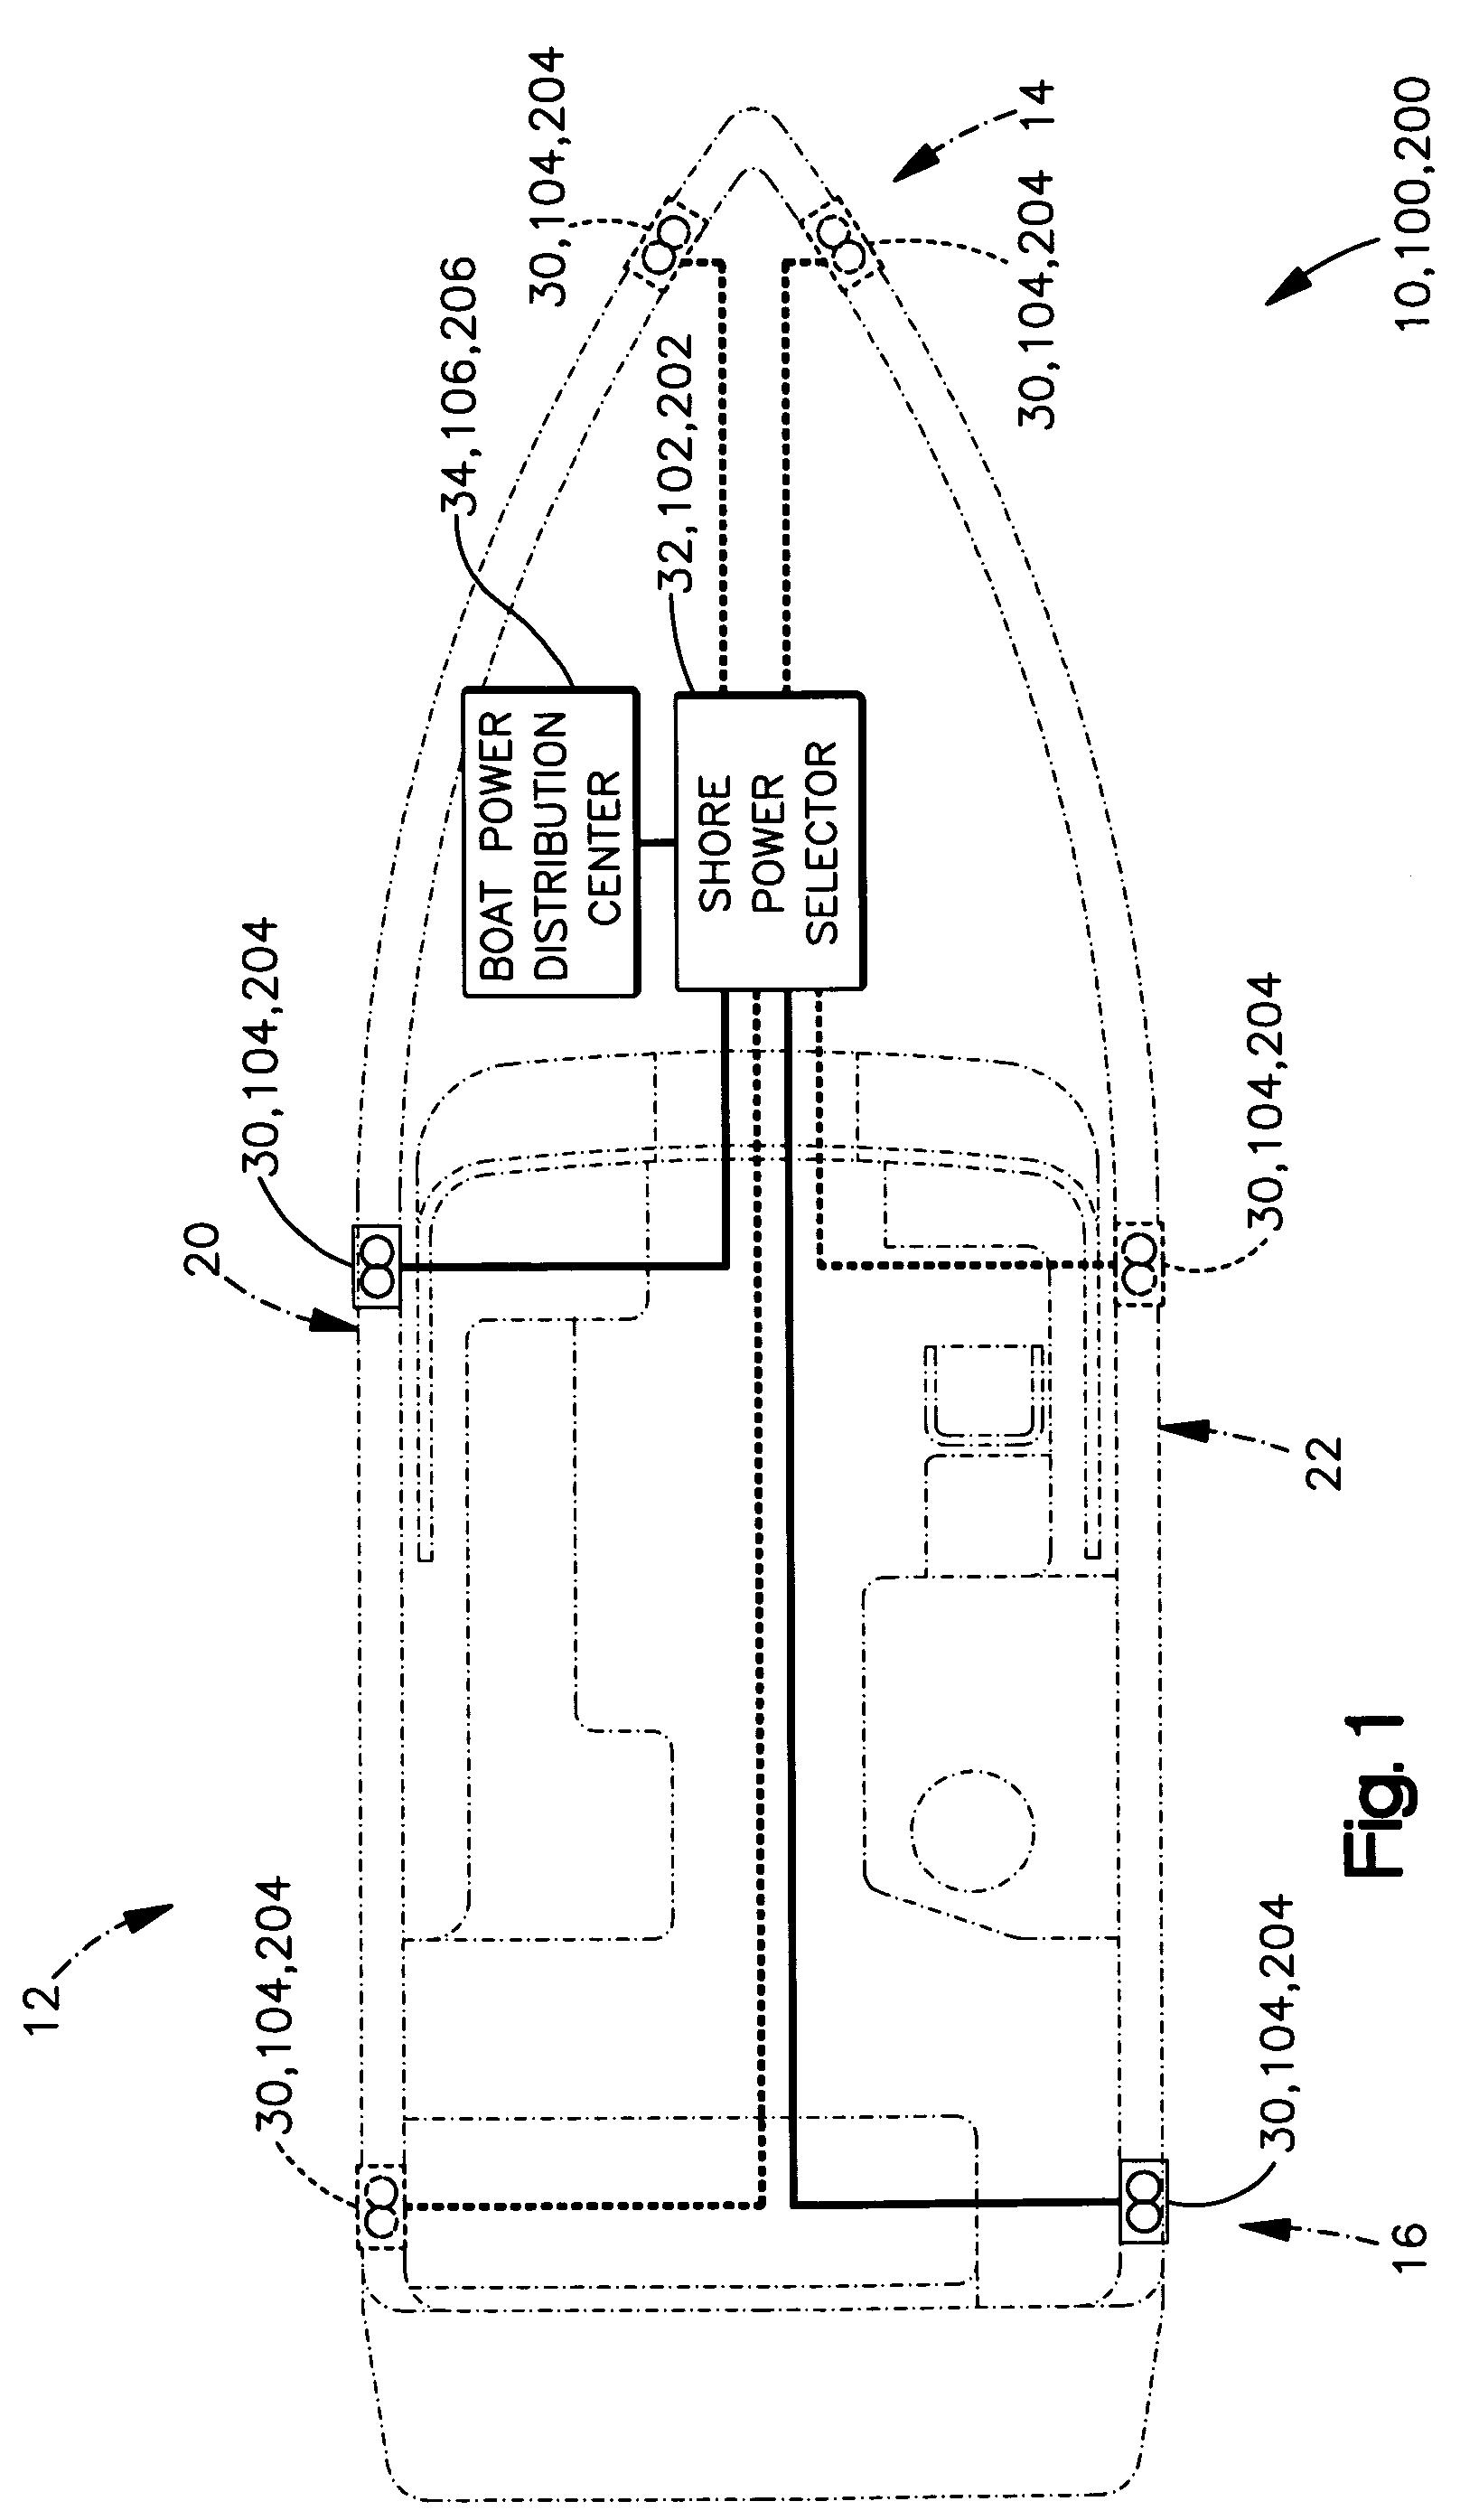 twist lock receptacle 30 amp shore power wiring diagram